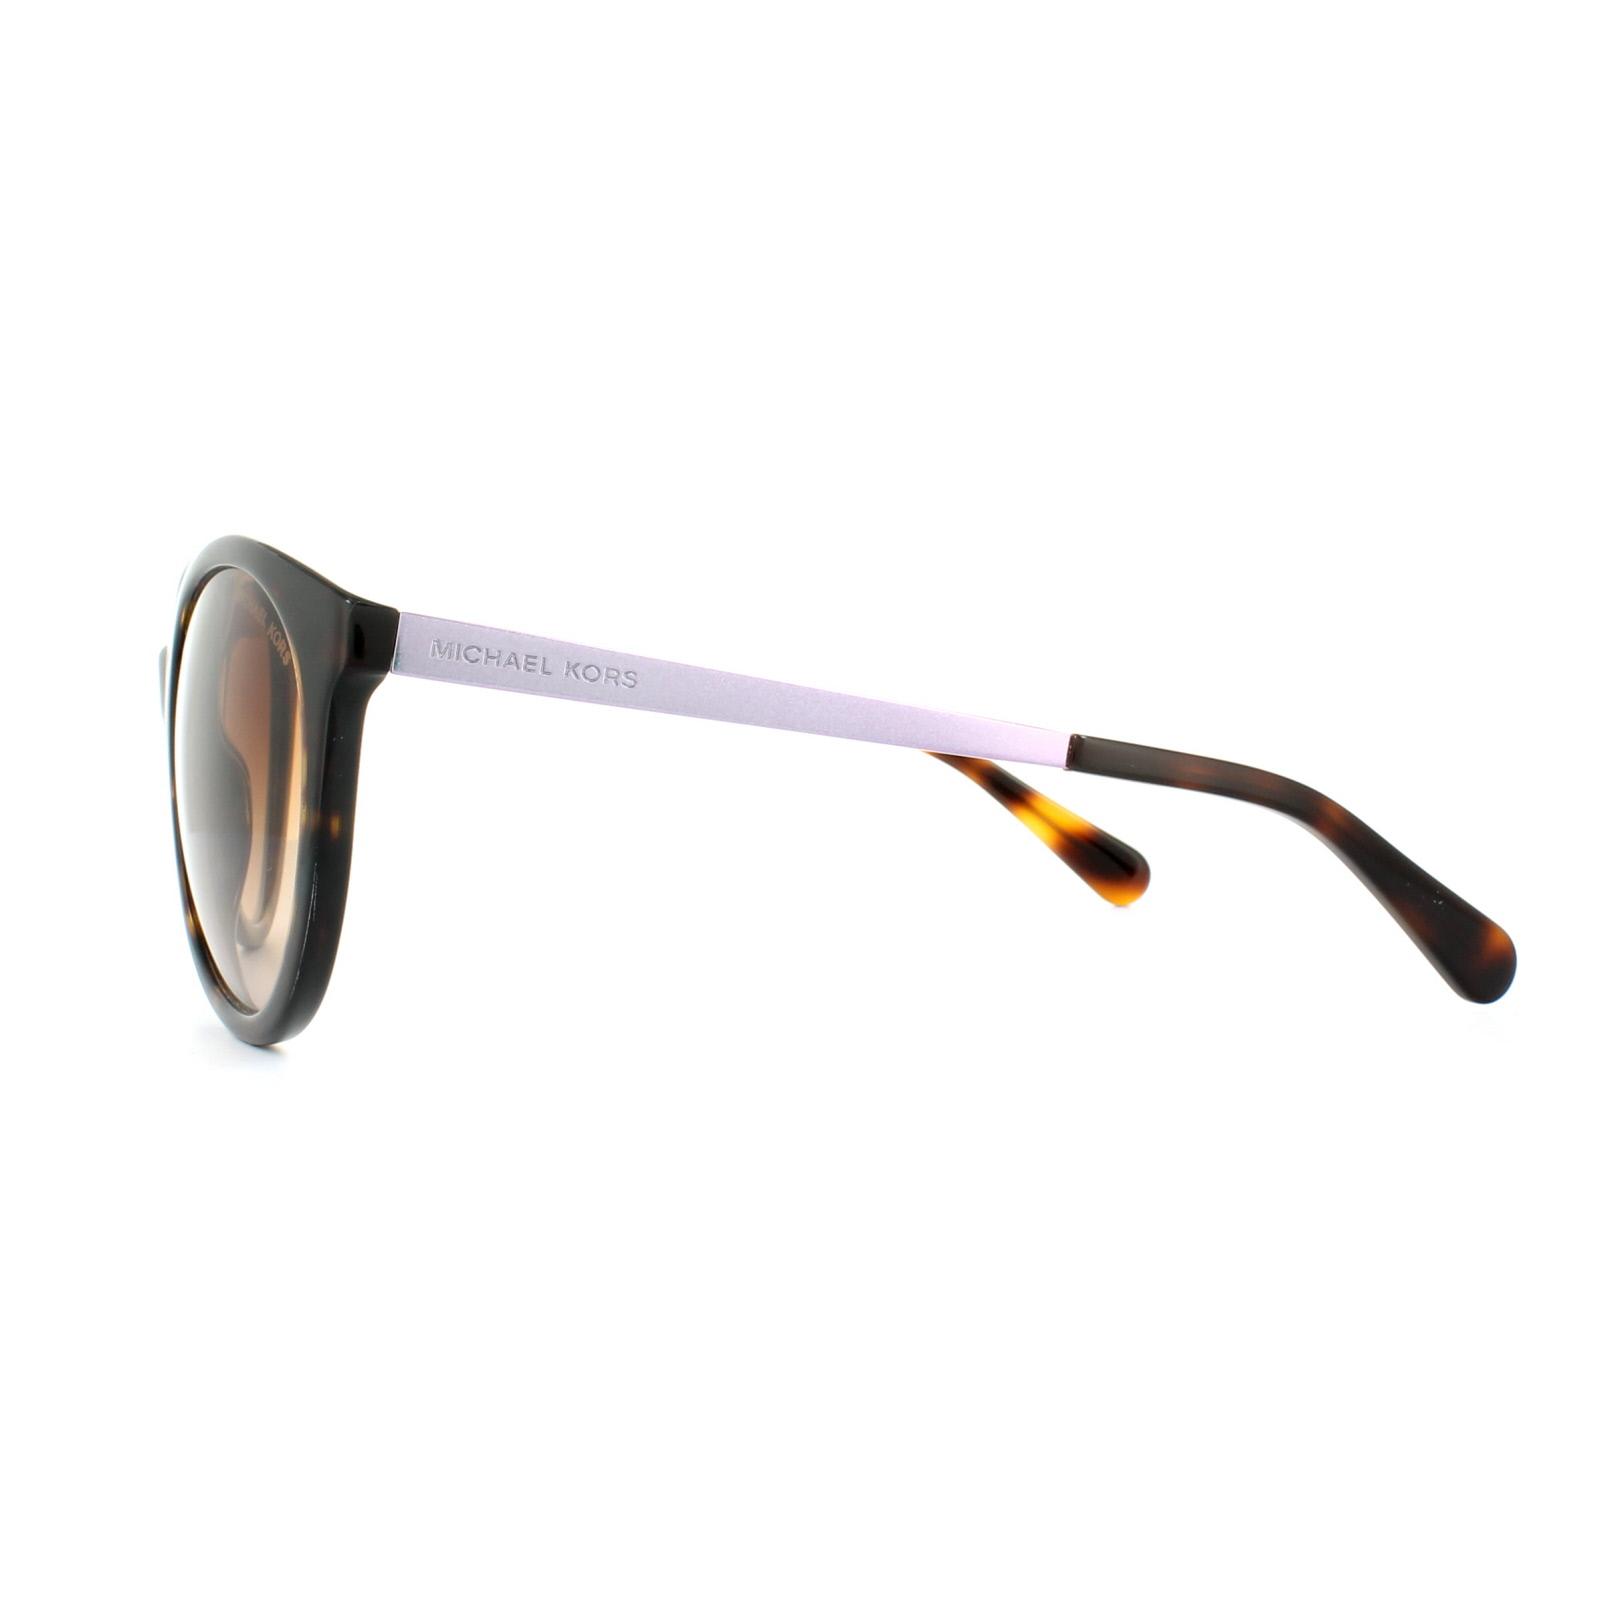 ba70a4057137 Buy michael kors sunglasses brown > OFF59% Discounted